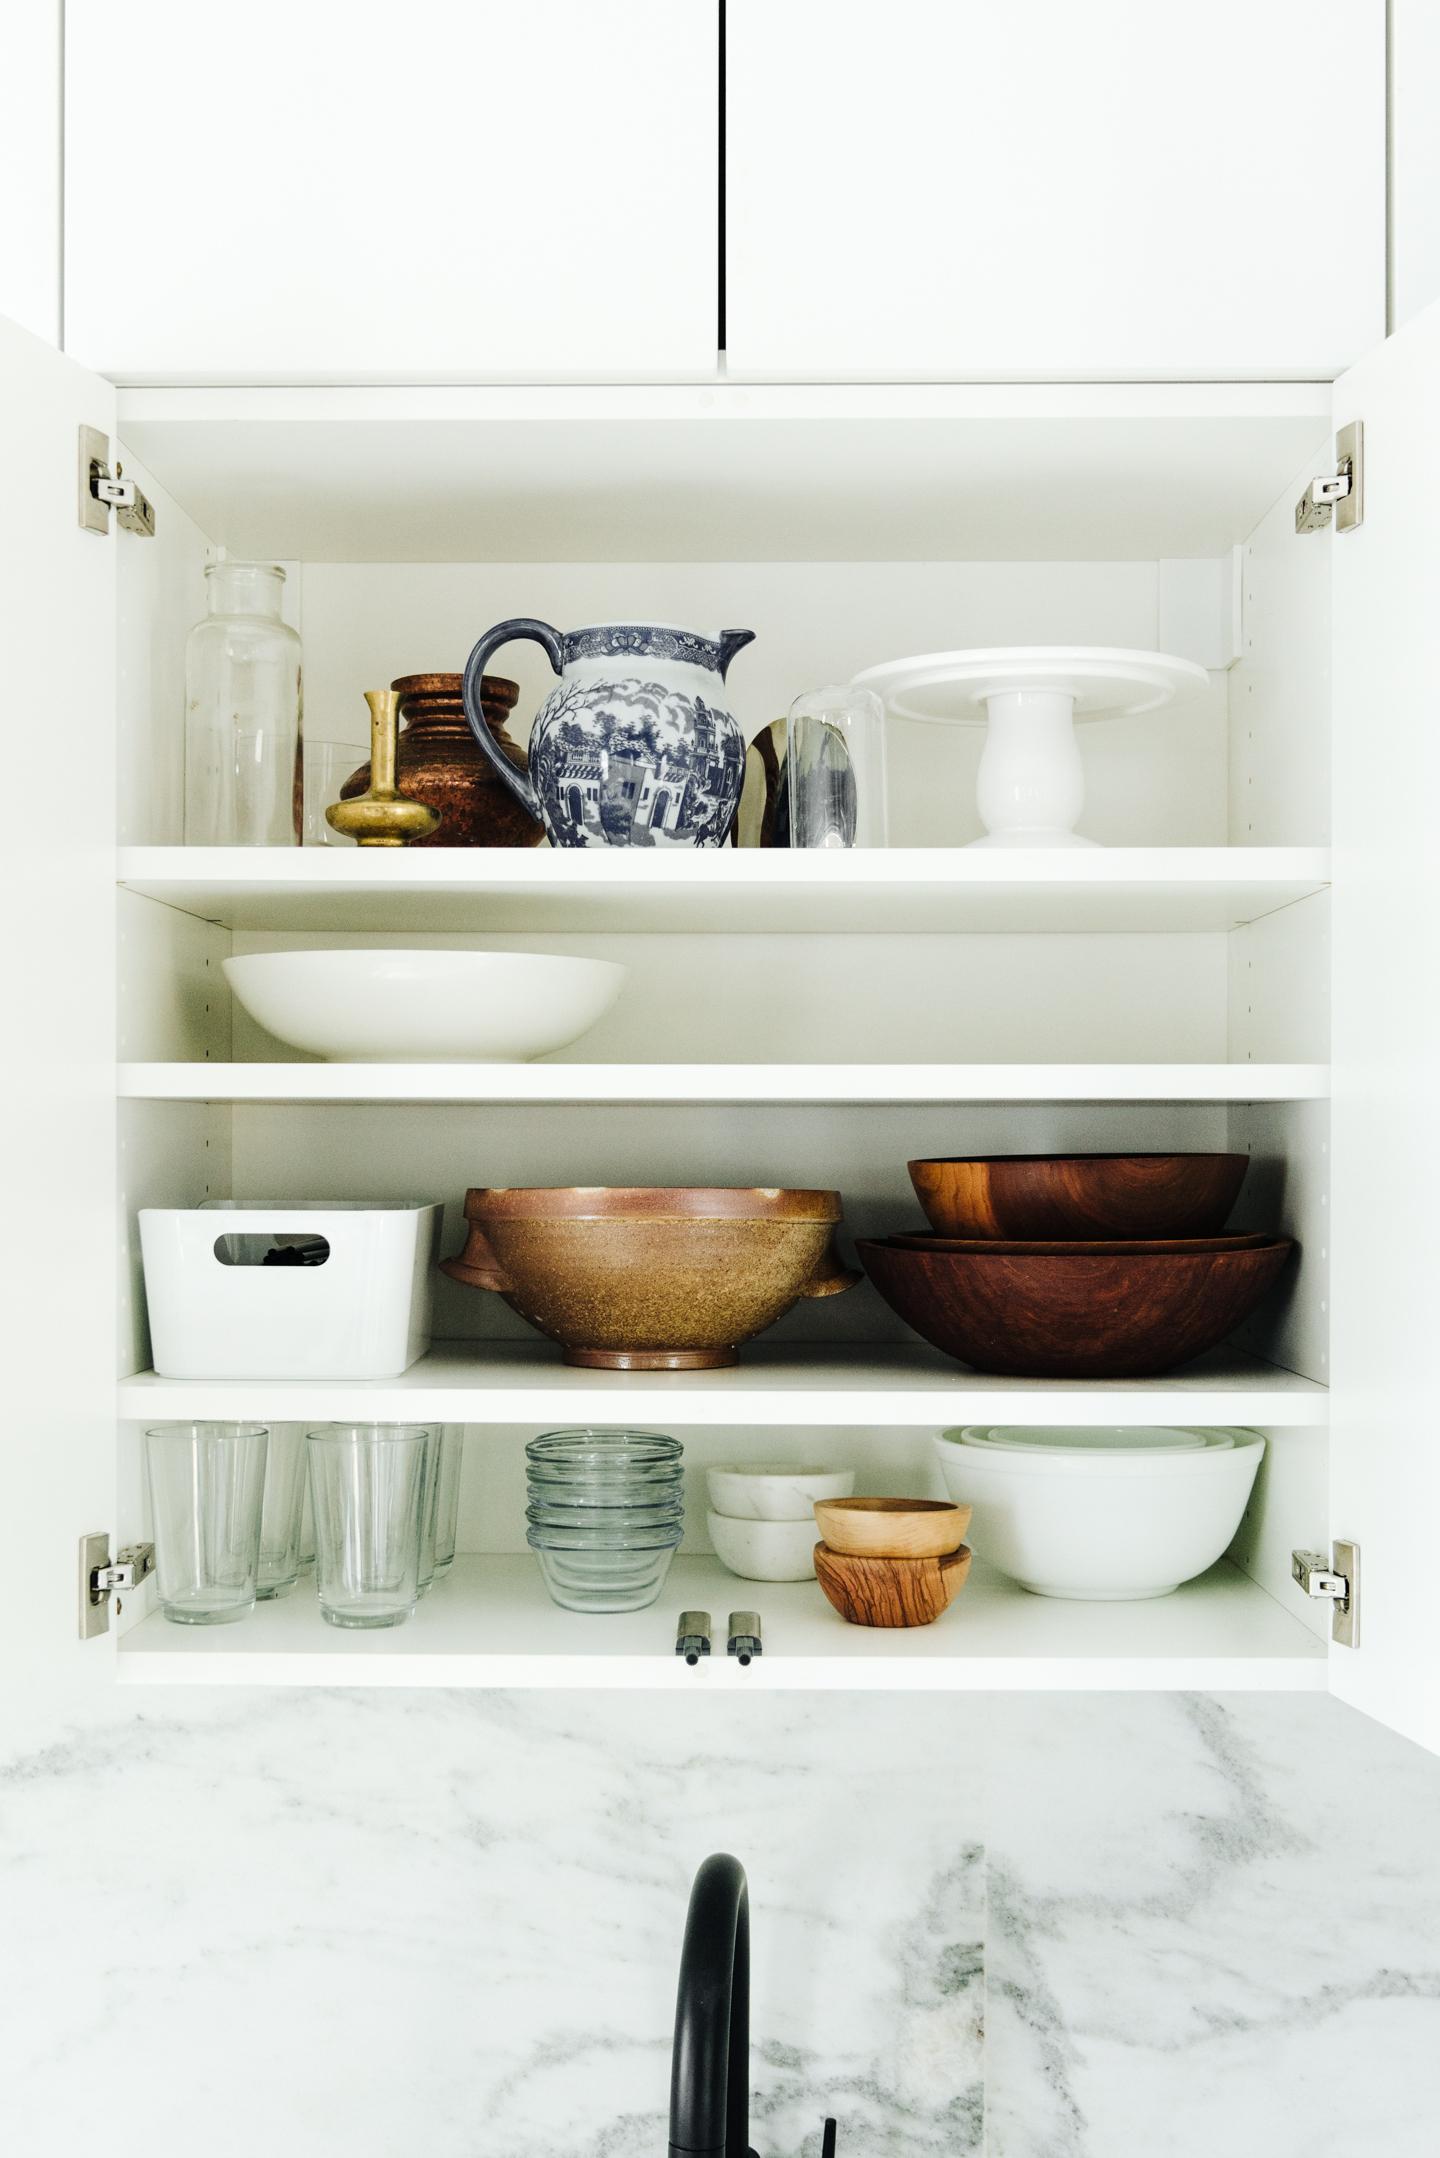 How to Organize Your Efficient Kitchen — OhCarlene